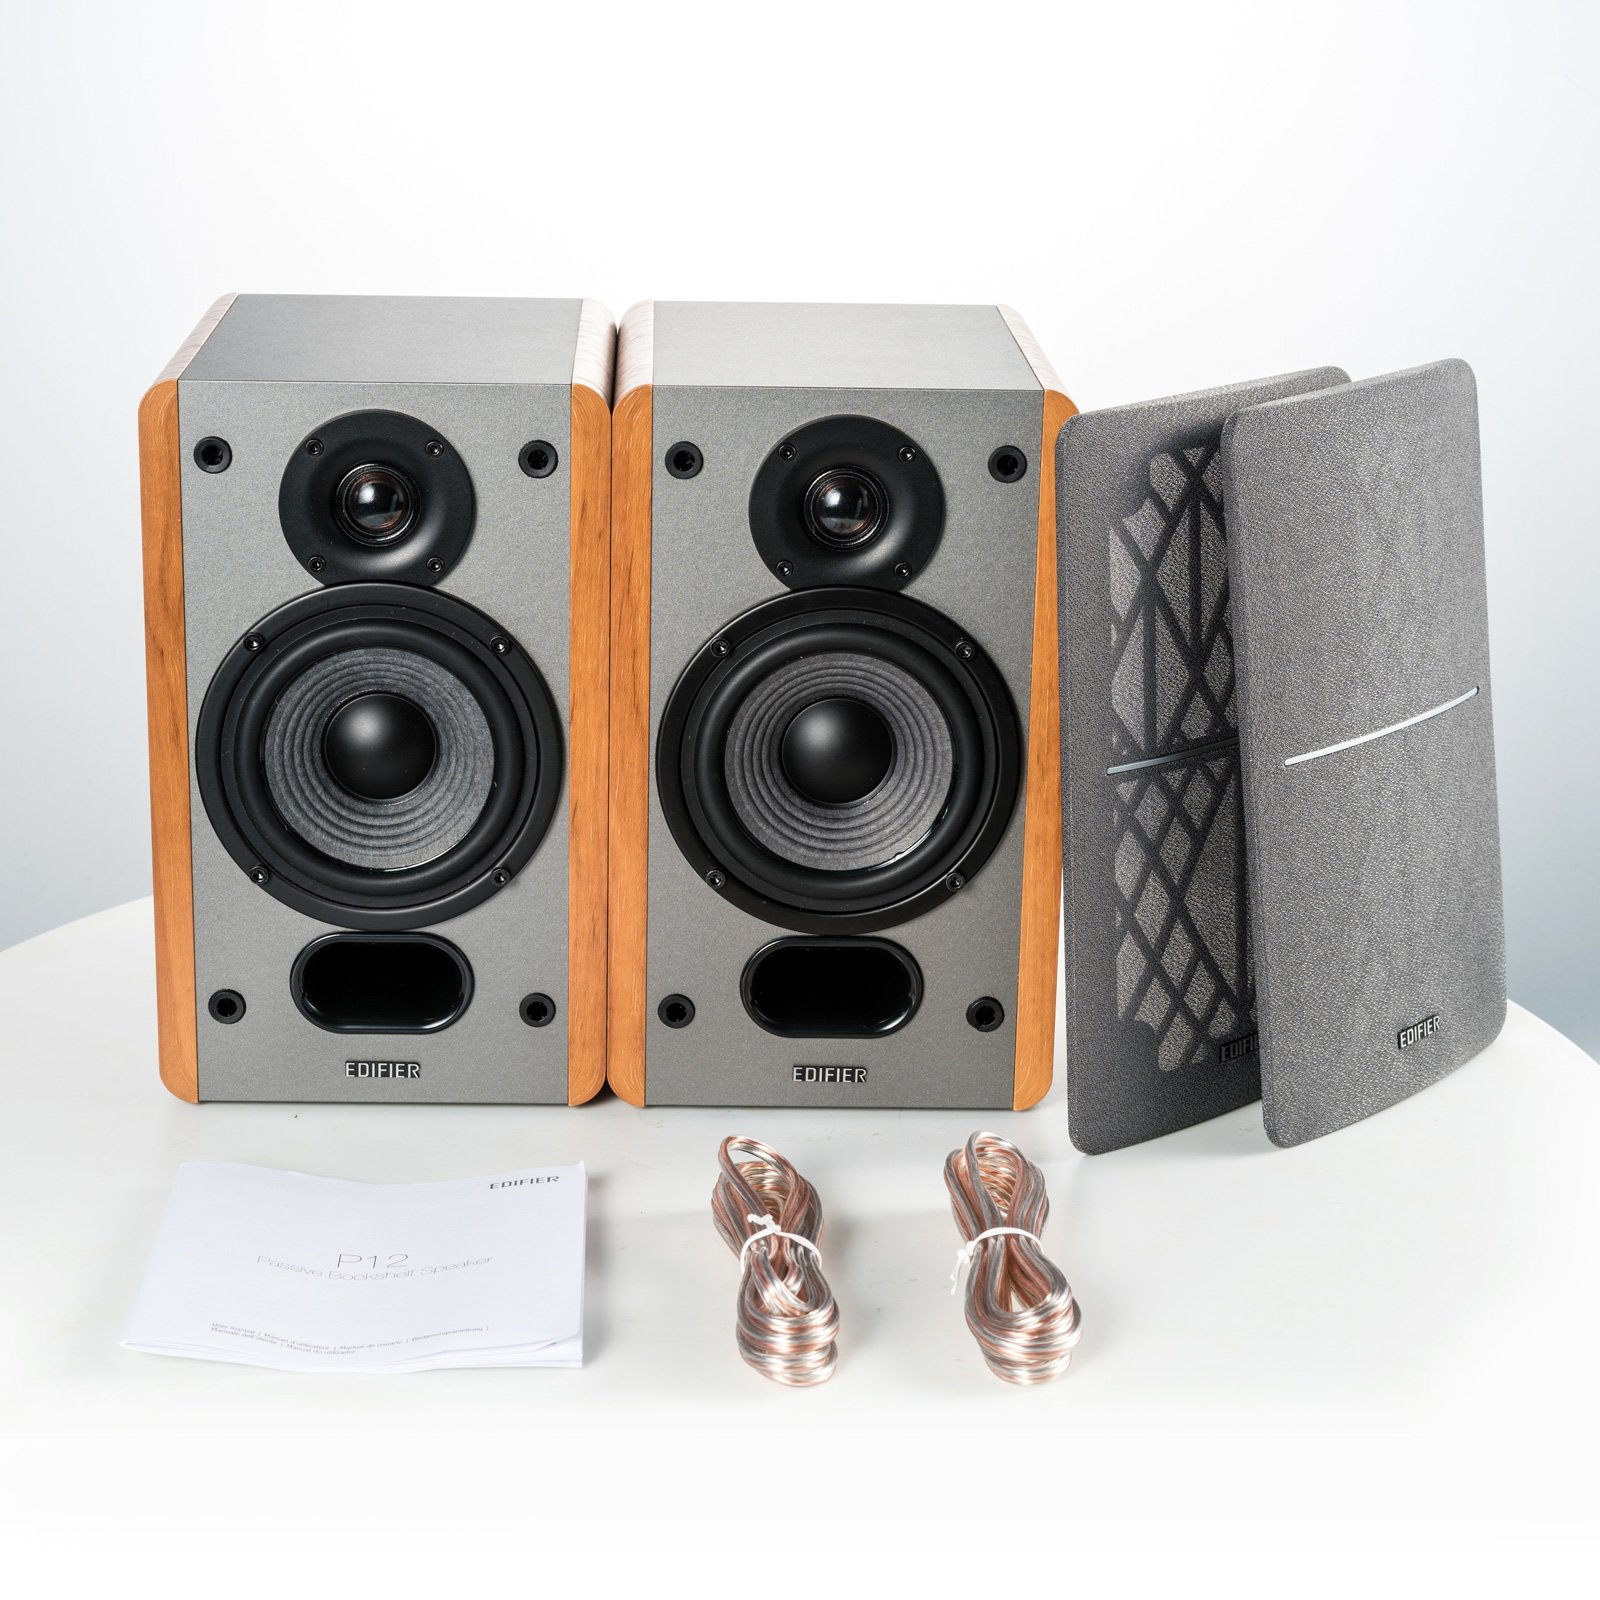 Edifier P12 Passive Bookshelf Speakers - 2-Way Speakers with Built-in Wall-Mount Bracket - Wood Color, Pair by Edifier (Image #5)